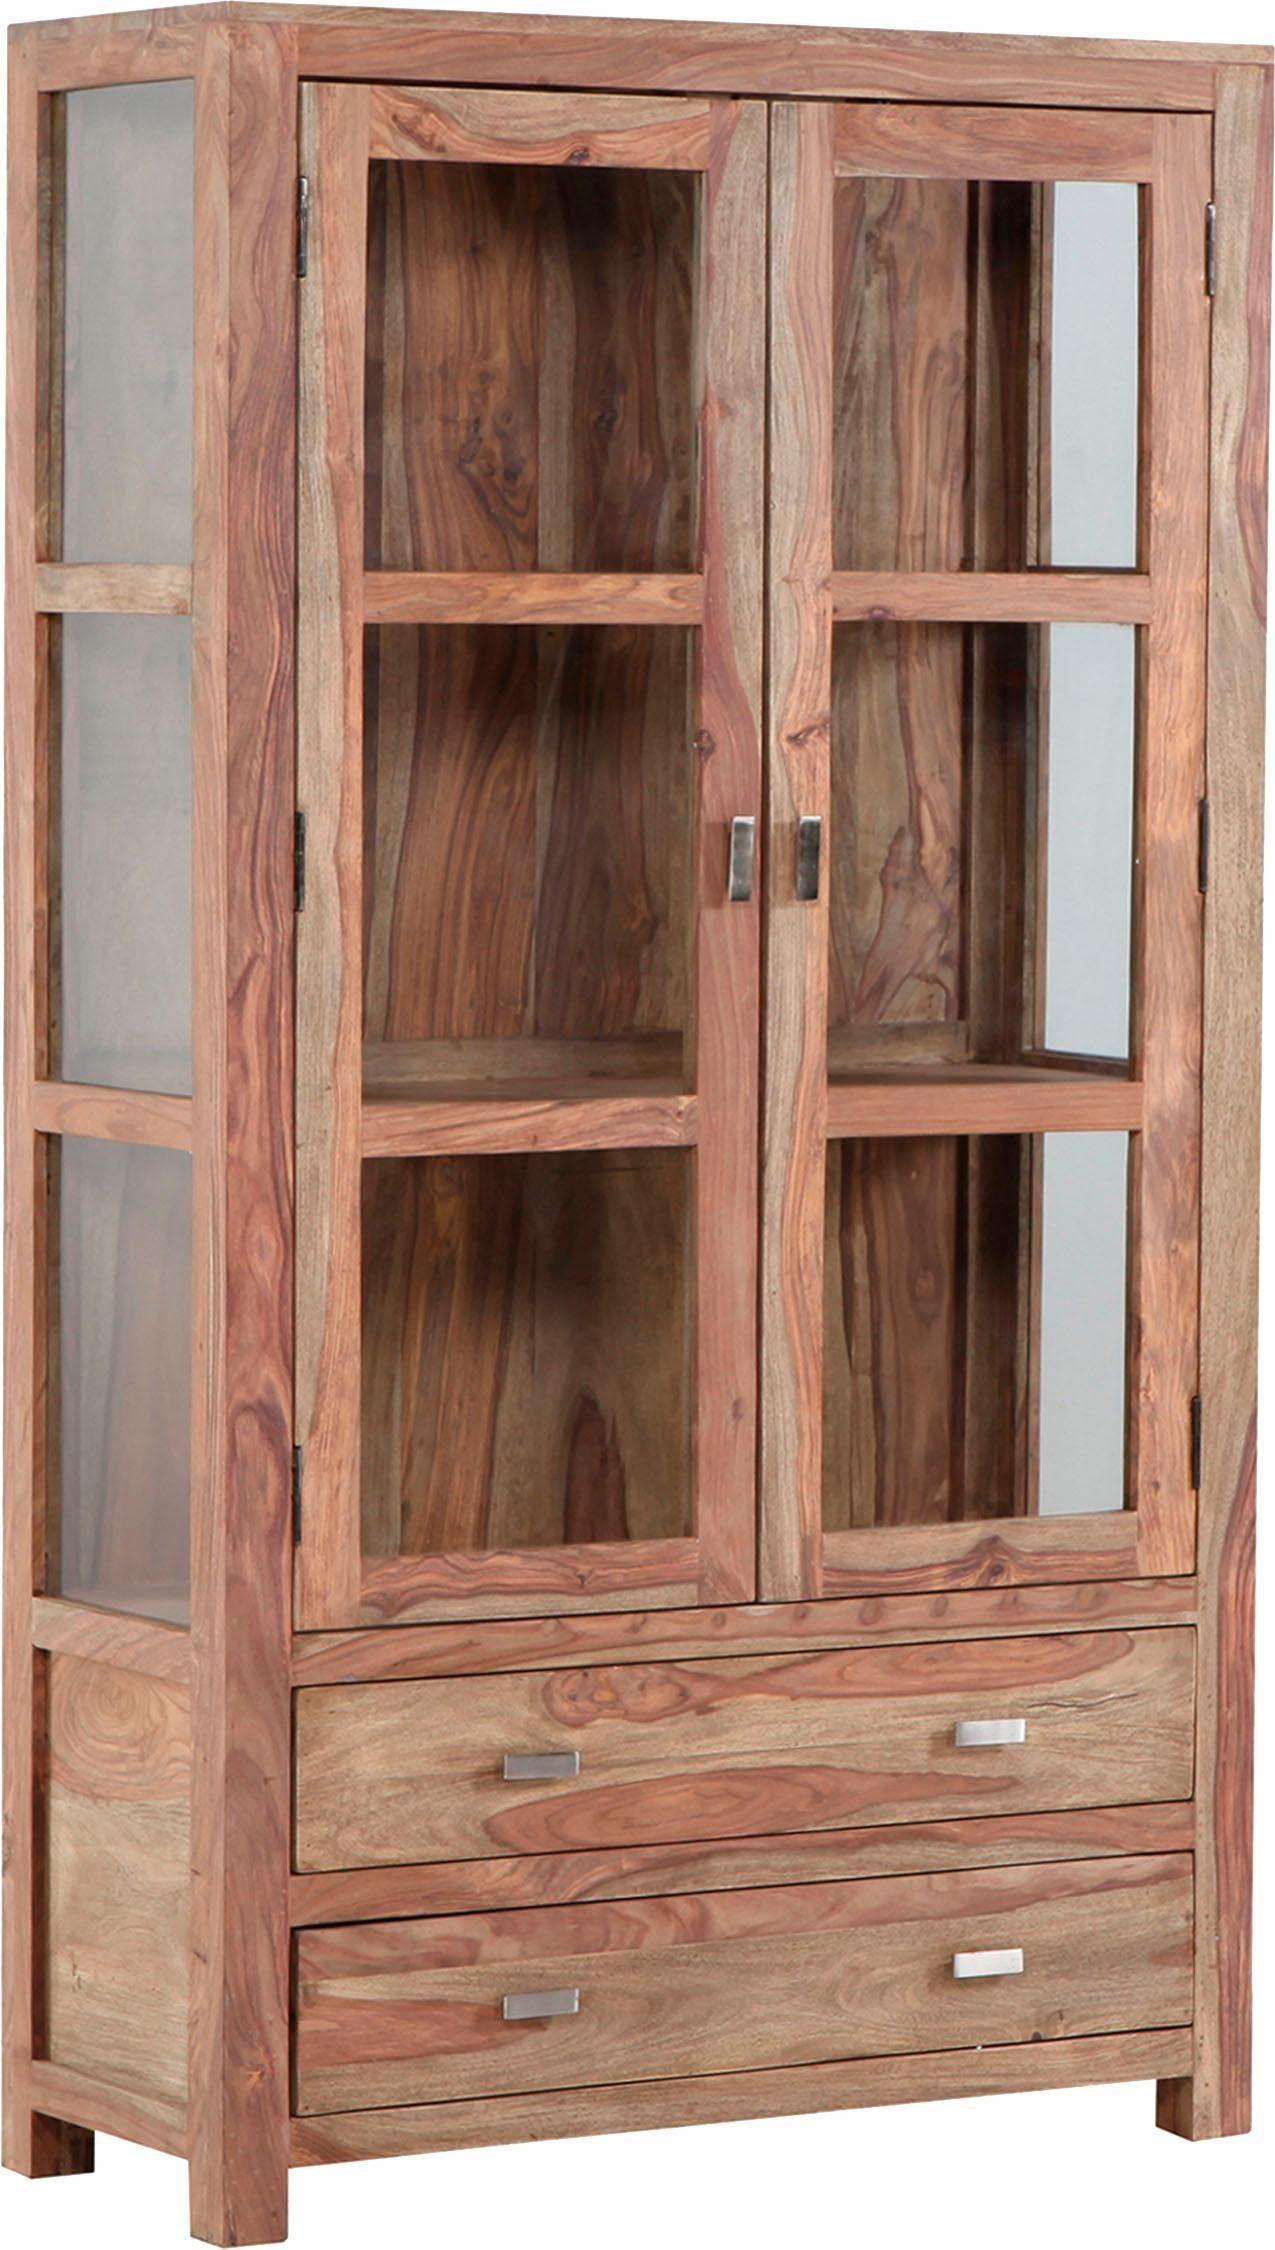 Gutmann Factory Vitrine »Inka« aus massivem Sheesham Holz, Höhe 180 cm